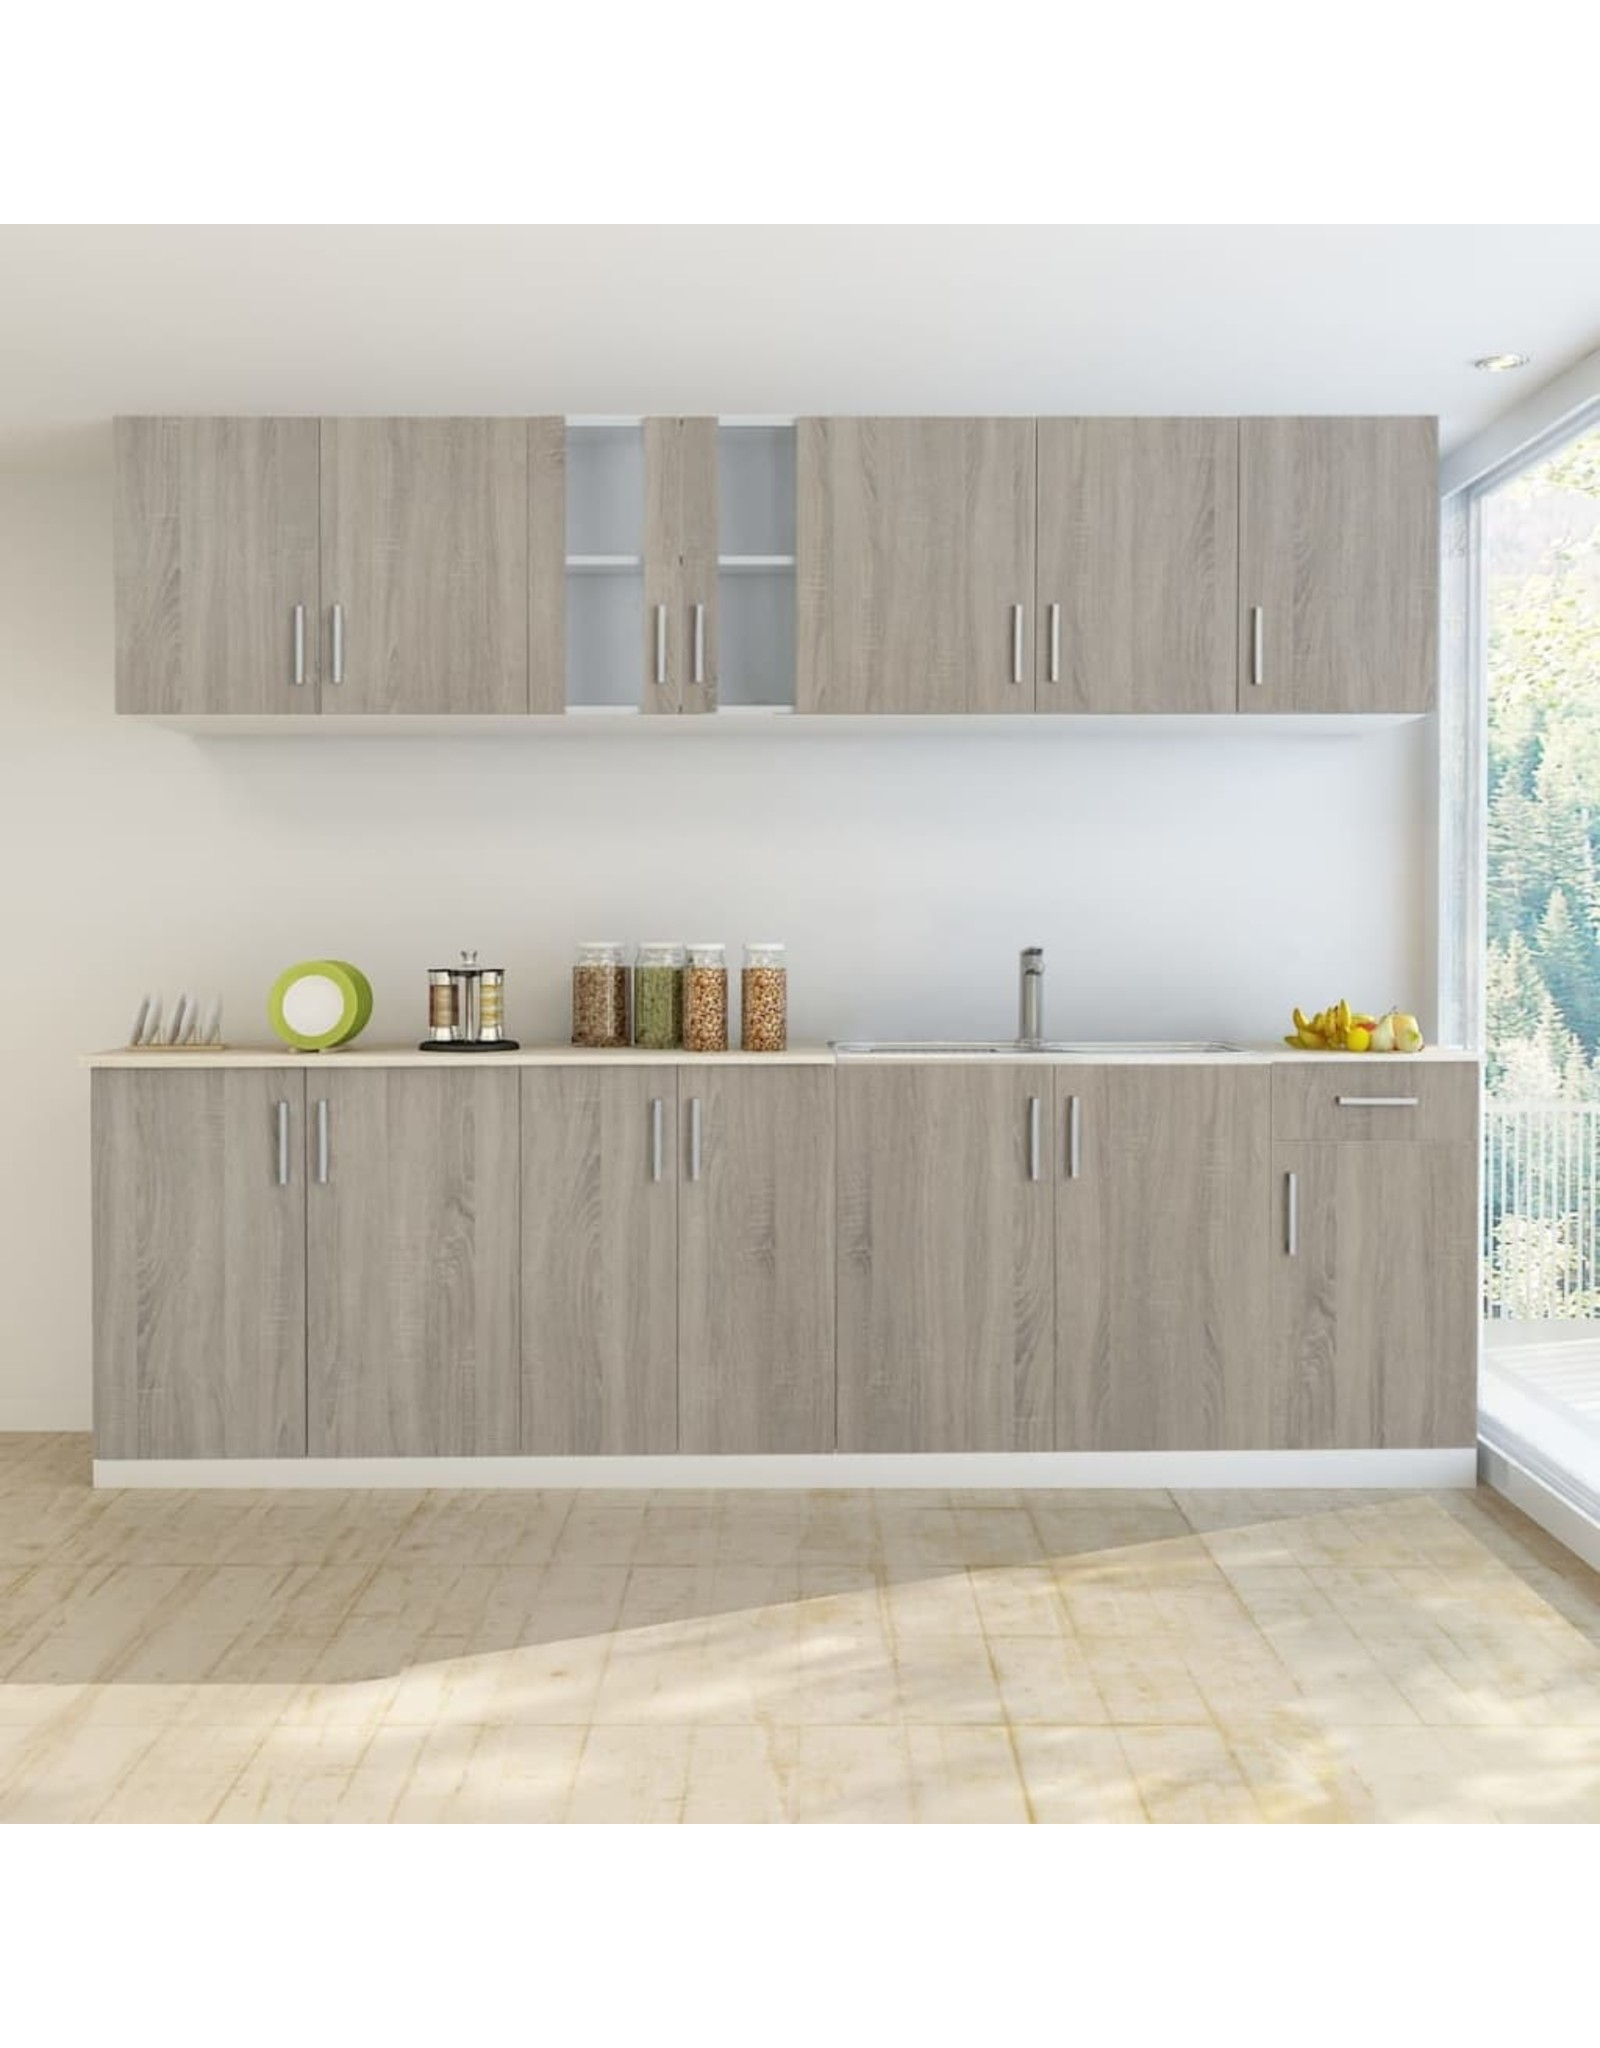 Keukenkastenset met gootsteenkast eiken-look 8-delig